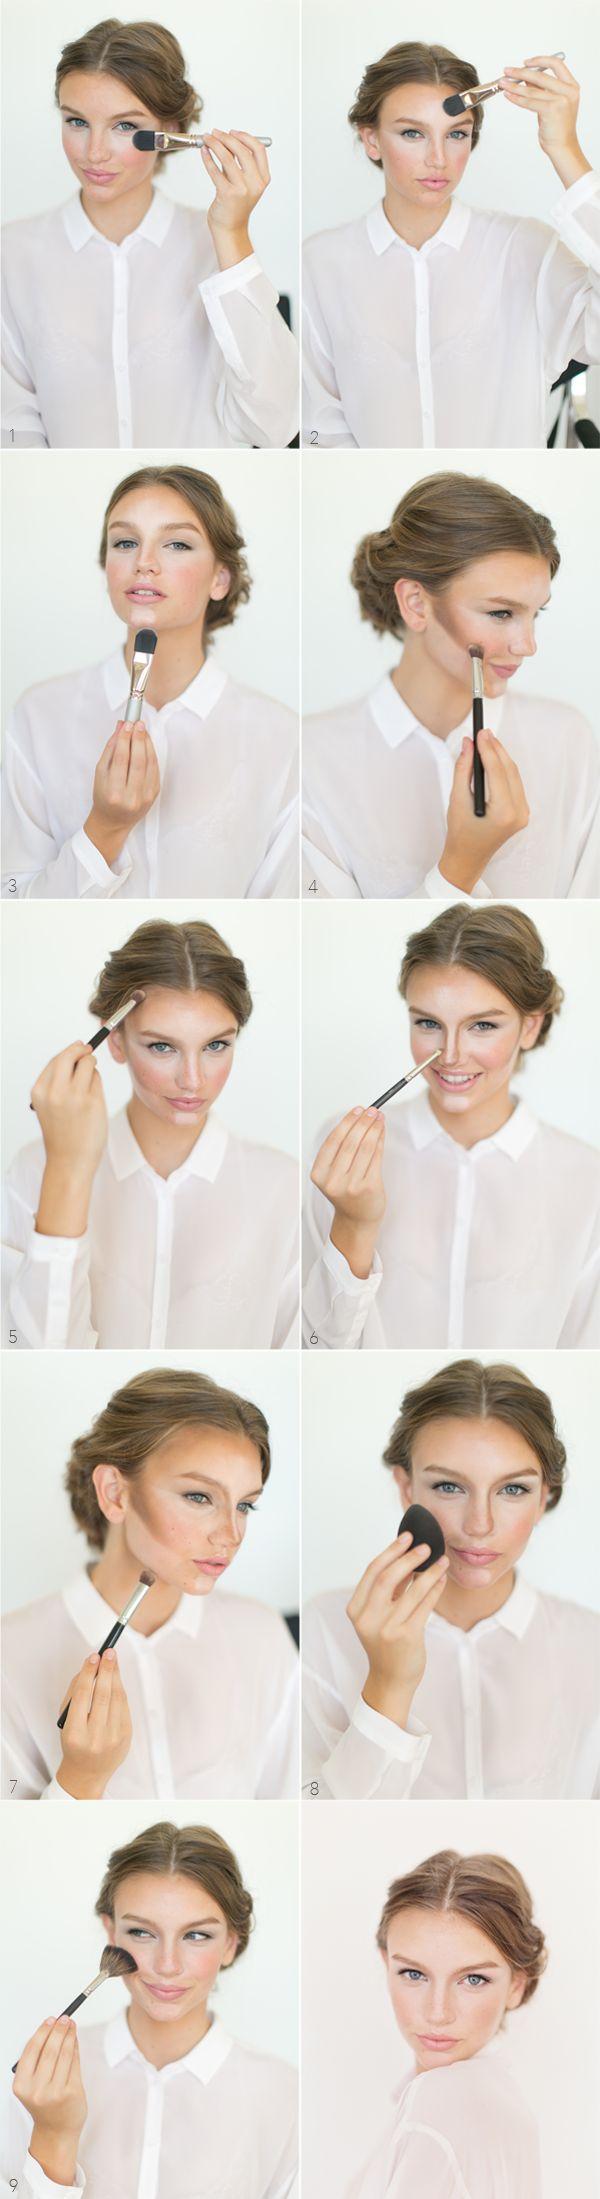 How To Highlight And Contour Makeup Tutorial Wonder Forest How To Blend  Contour Makeup Find And